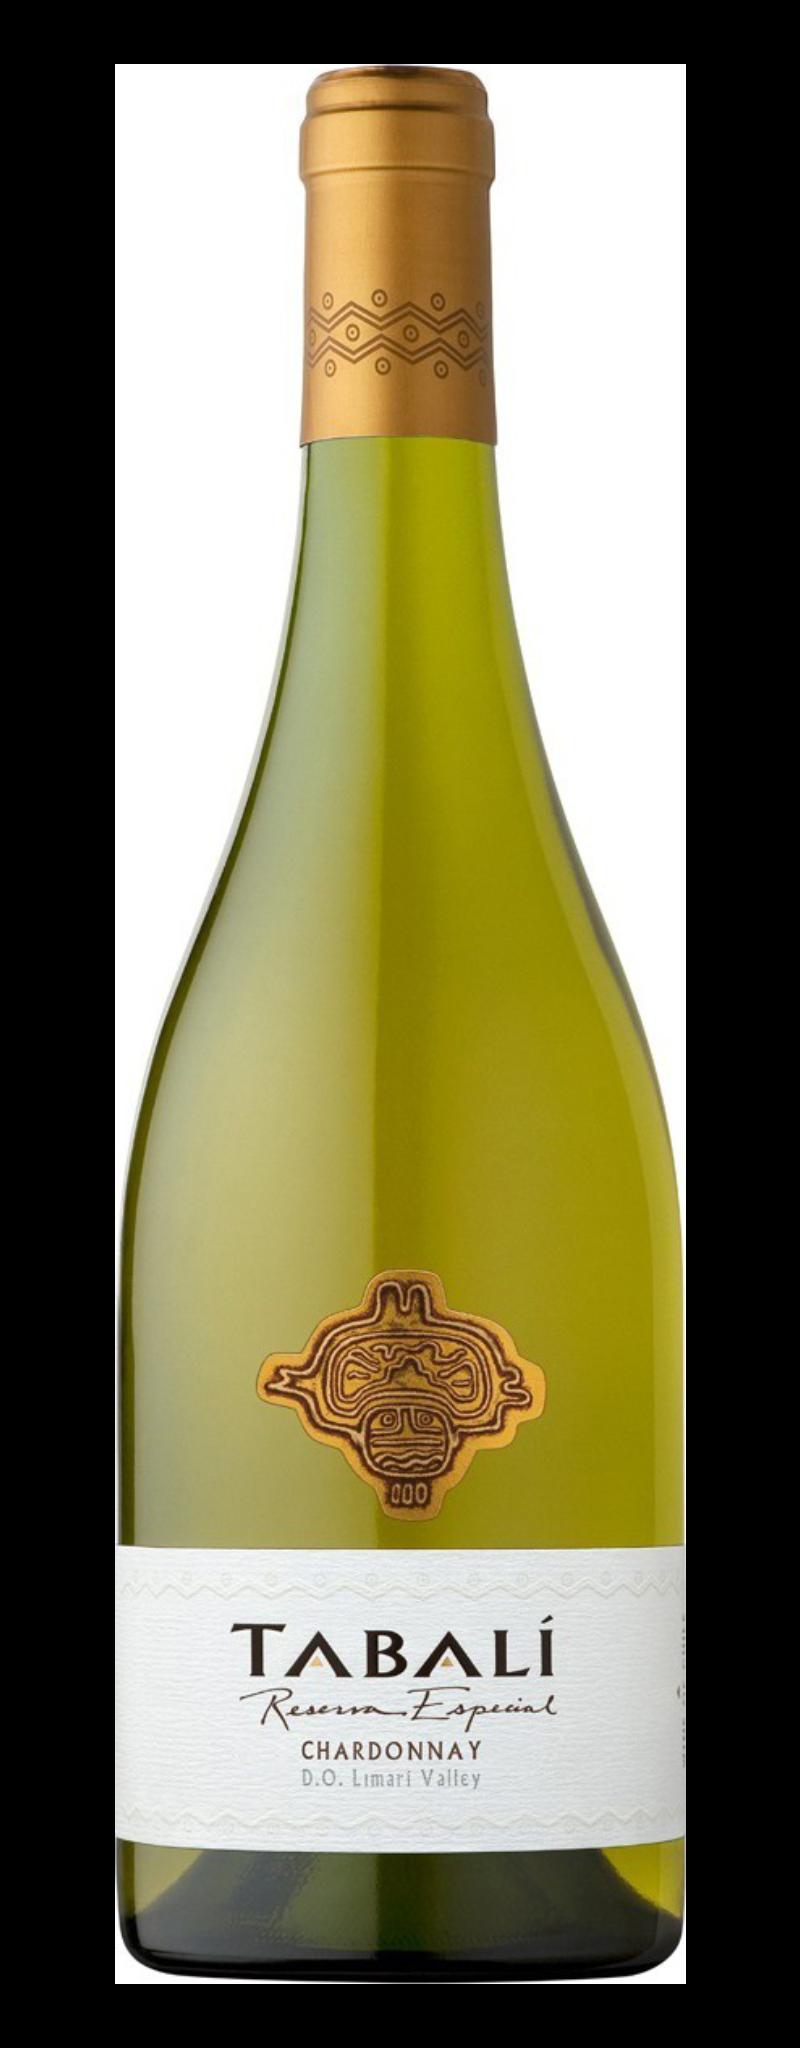 Tabali Reserva Especial Chardonnay  - 750ml